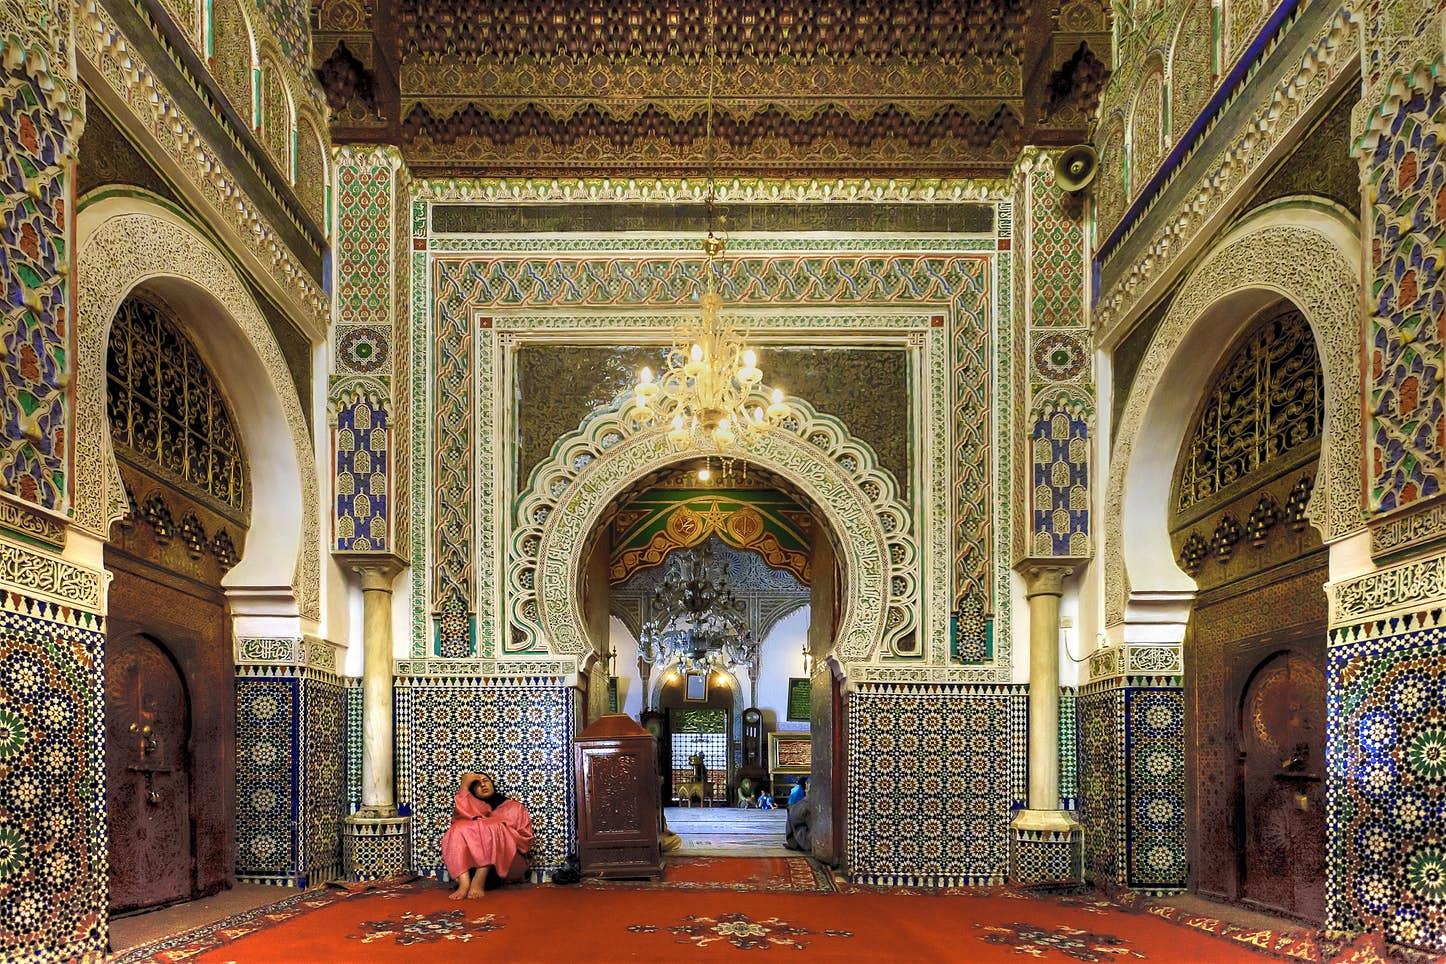 Morocco's resplendent tombs